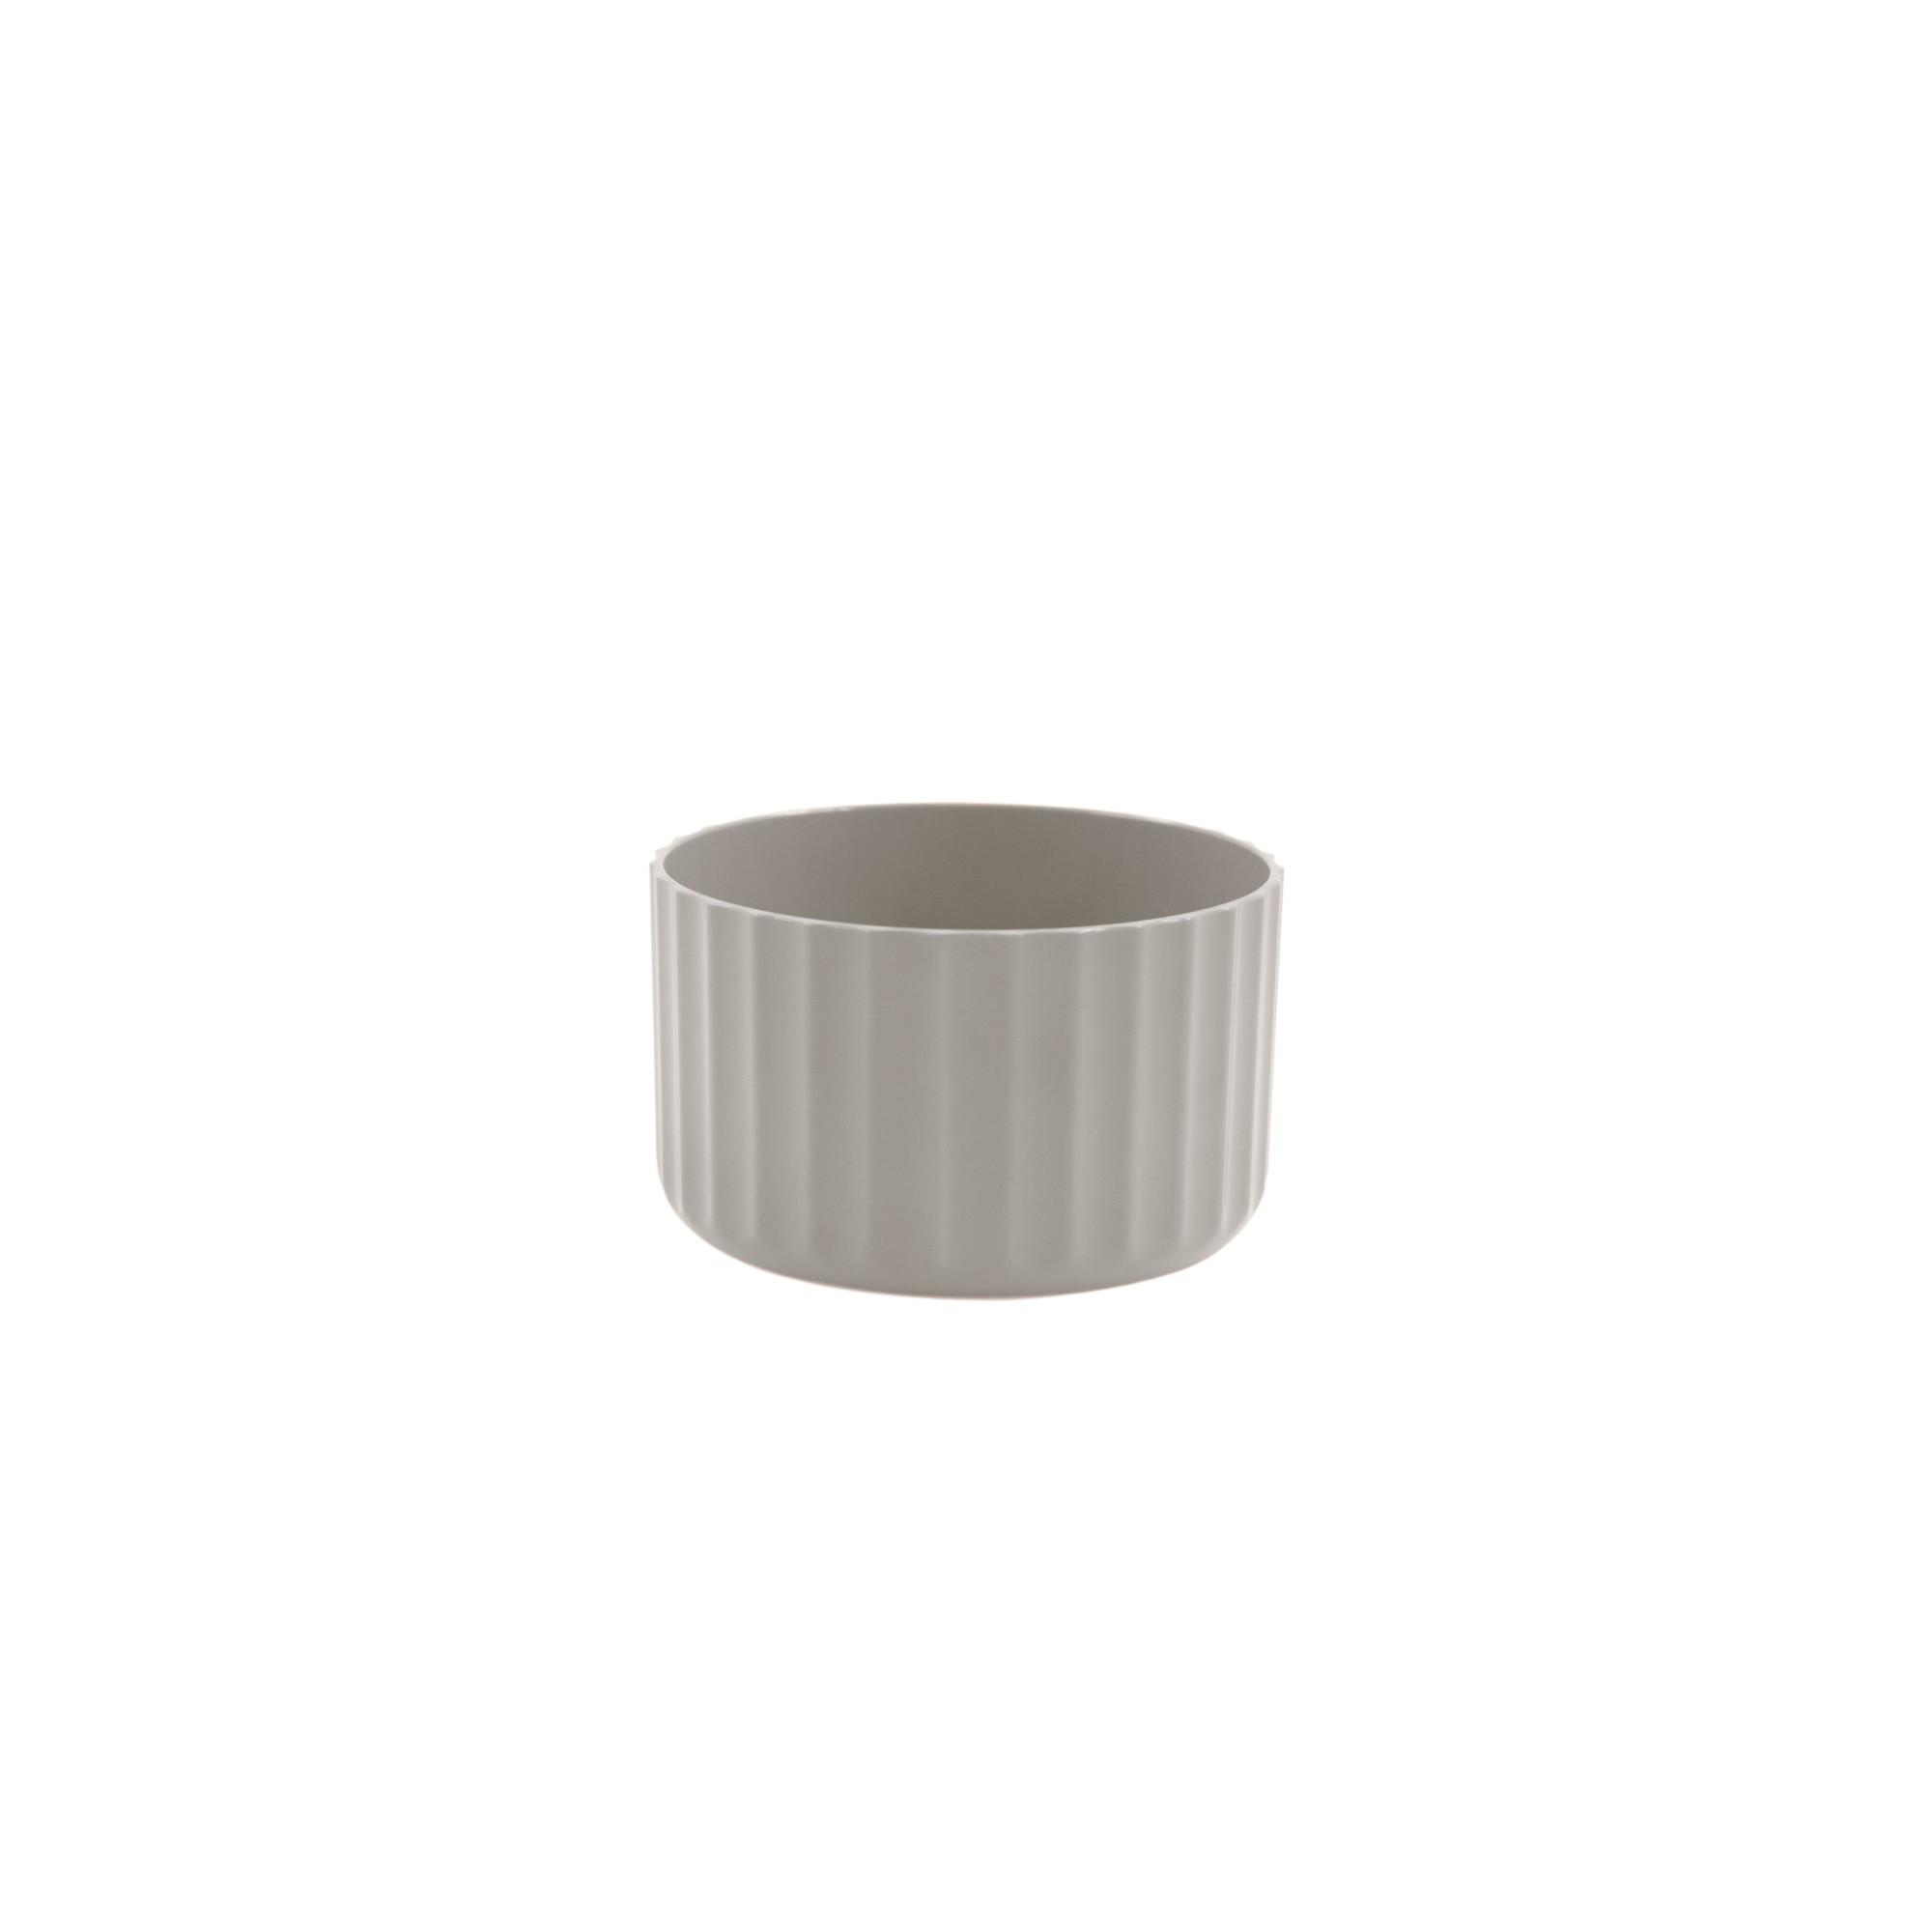 Vaso para Plantas Plastico 6x996 cm Groove Mini Bege - Ou